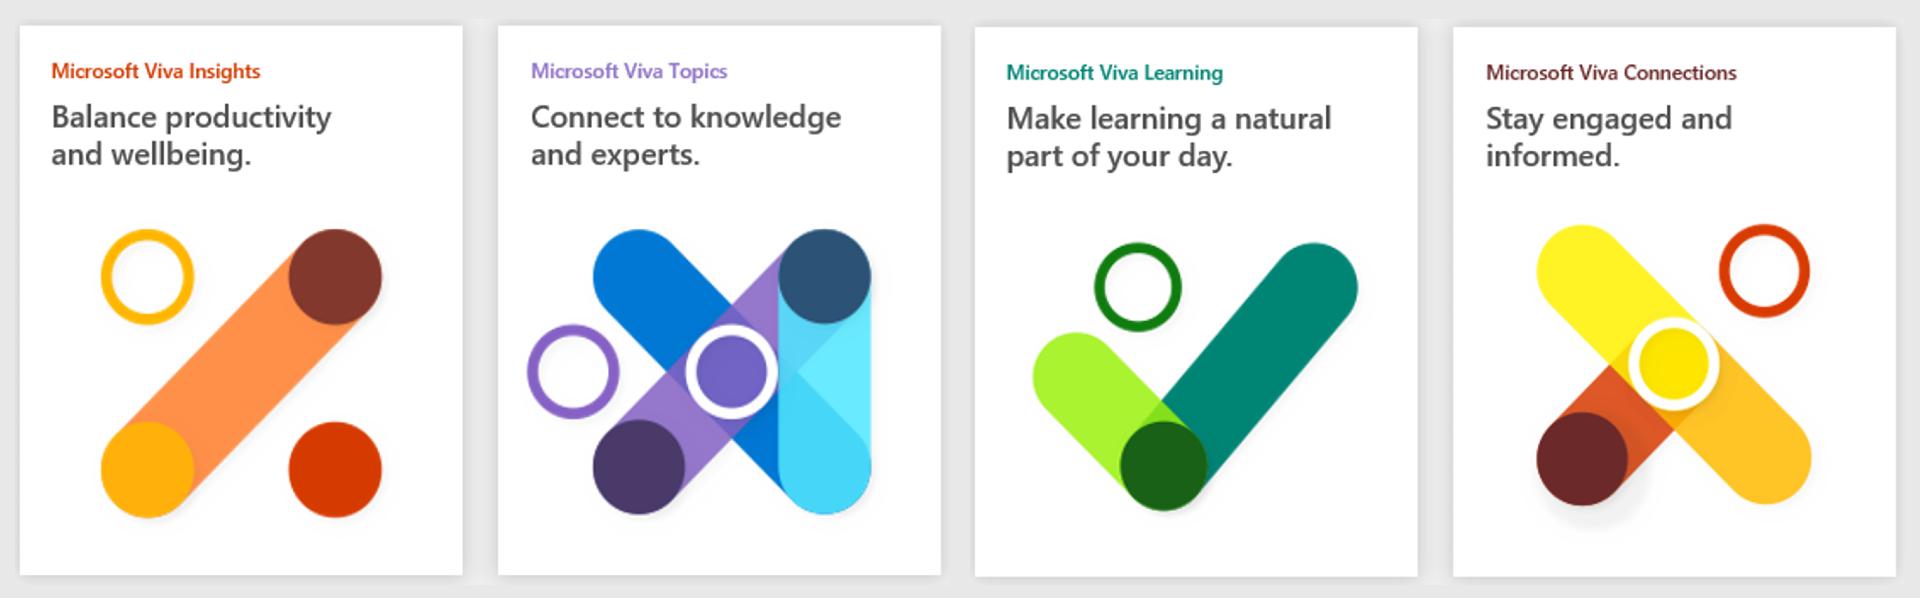 Microsoft Viva Overview